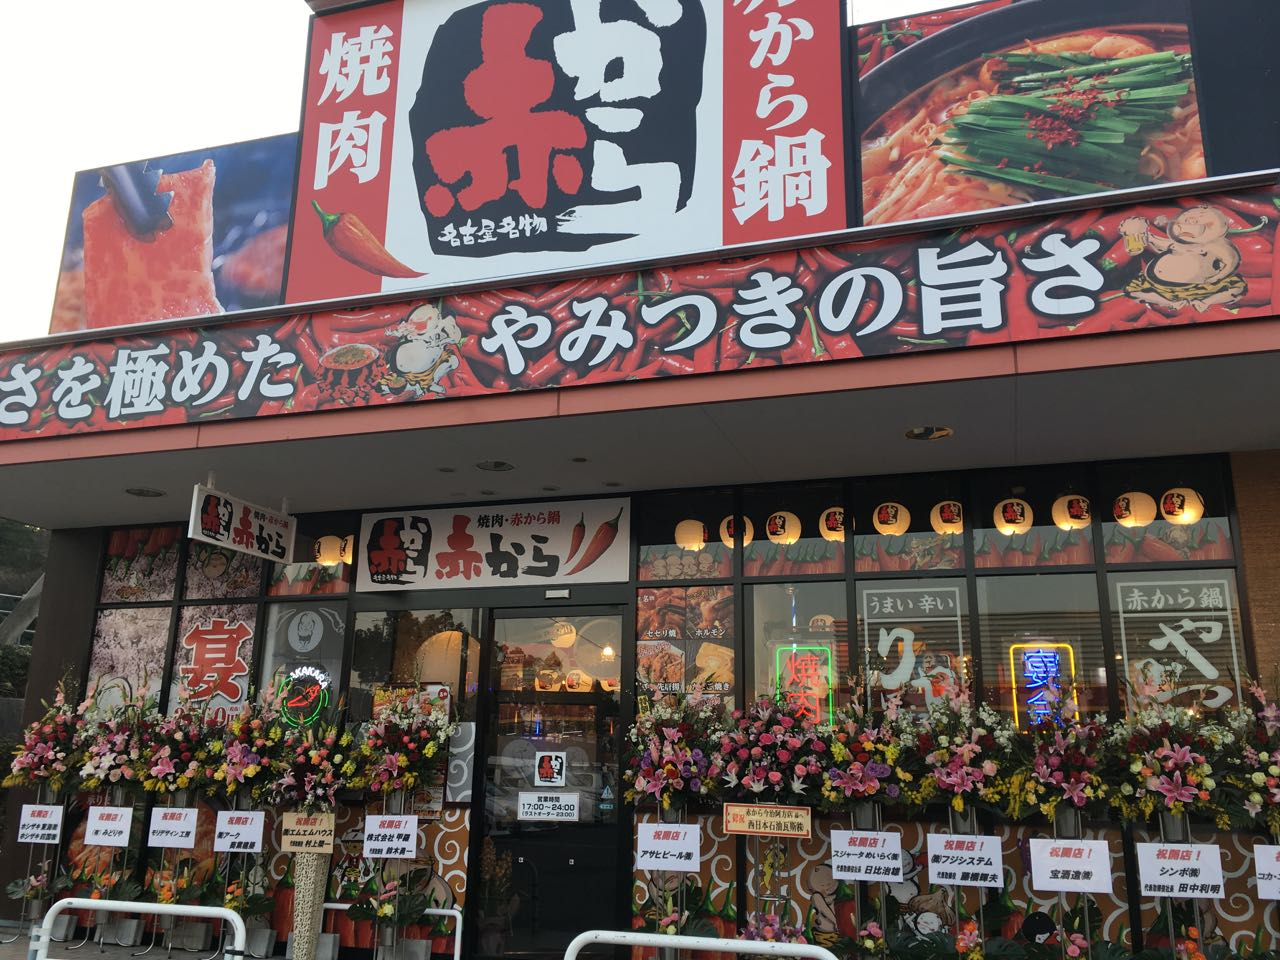 ehime,imabari,みとん今治,今治,愛媛,新店オープン,焼肉,赤から,赤から鍋,鍋